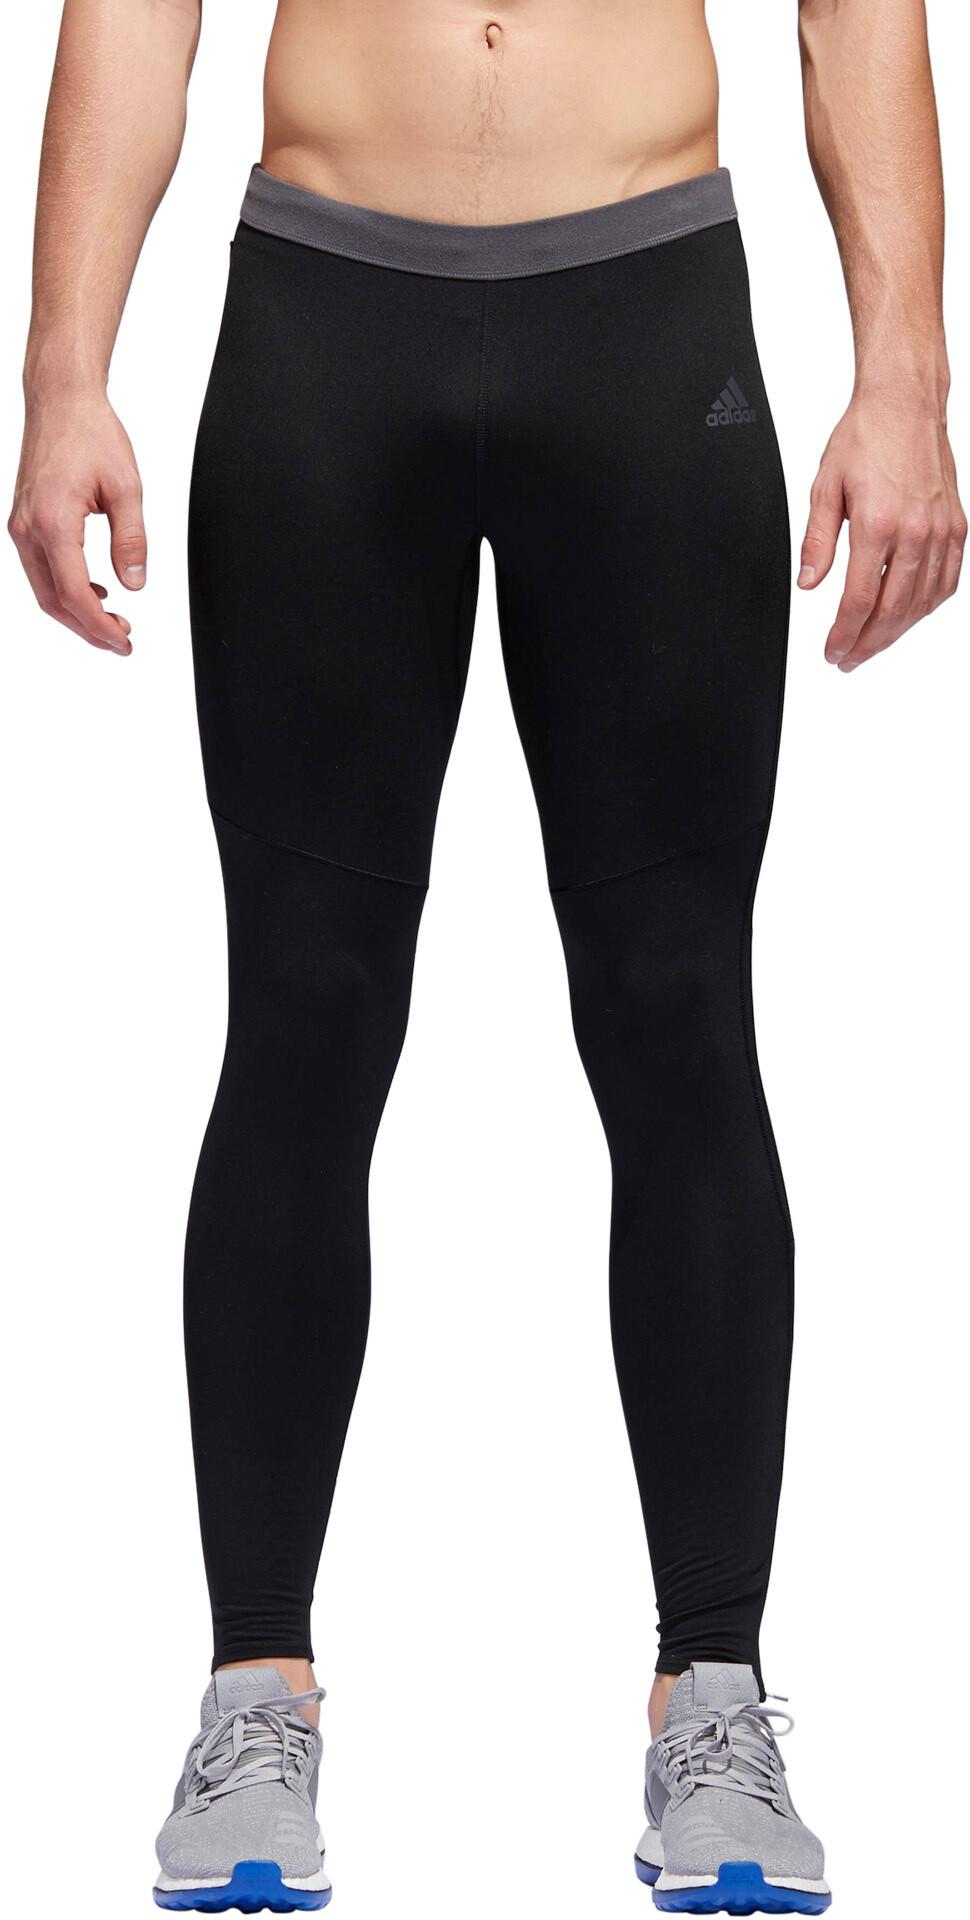 adidas Response Climawarm - Pantalones largos running Hombre - negro ... 6328921c21ad